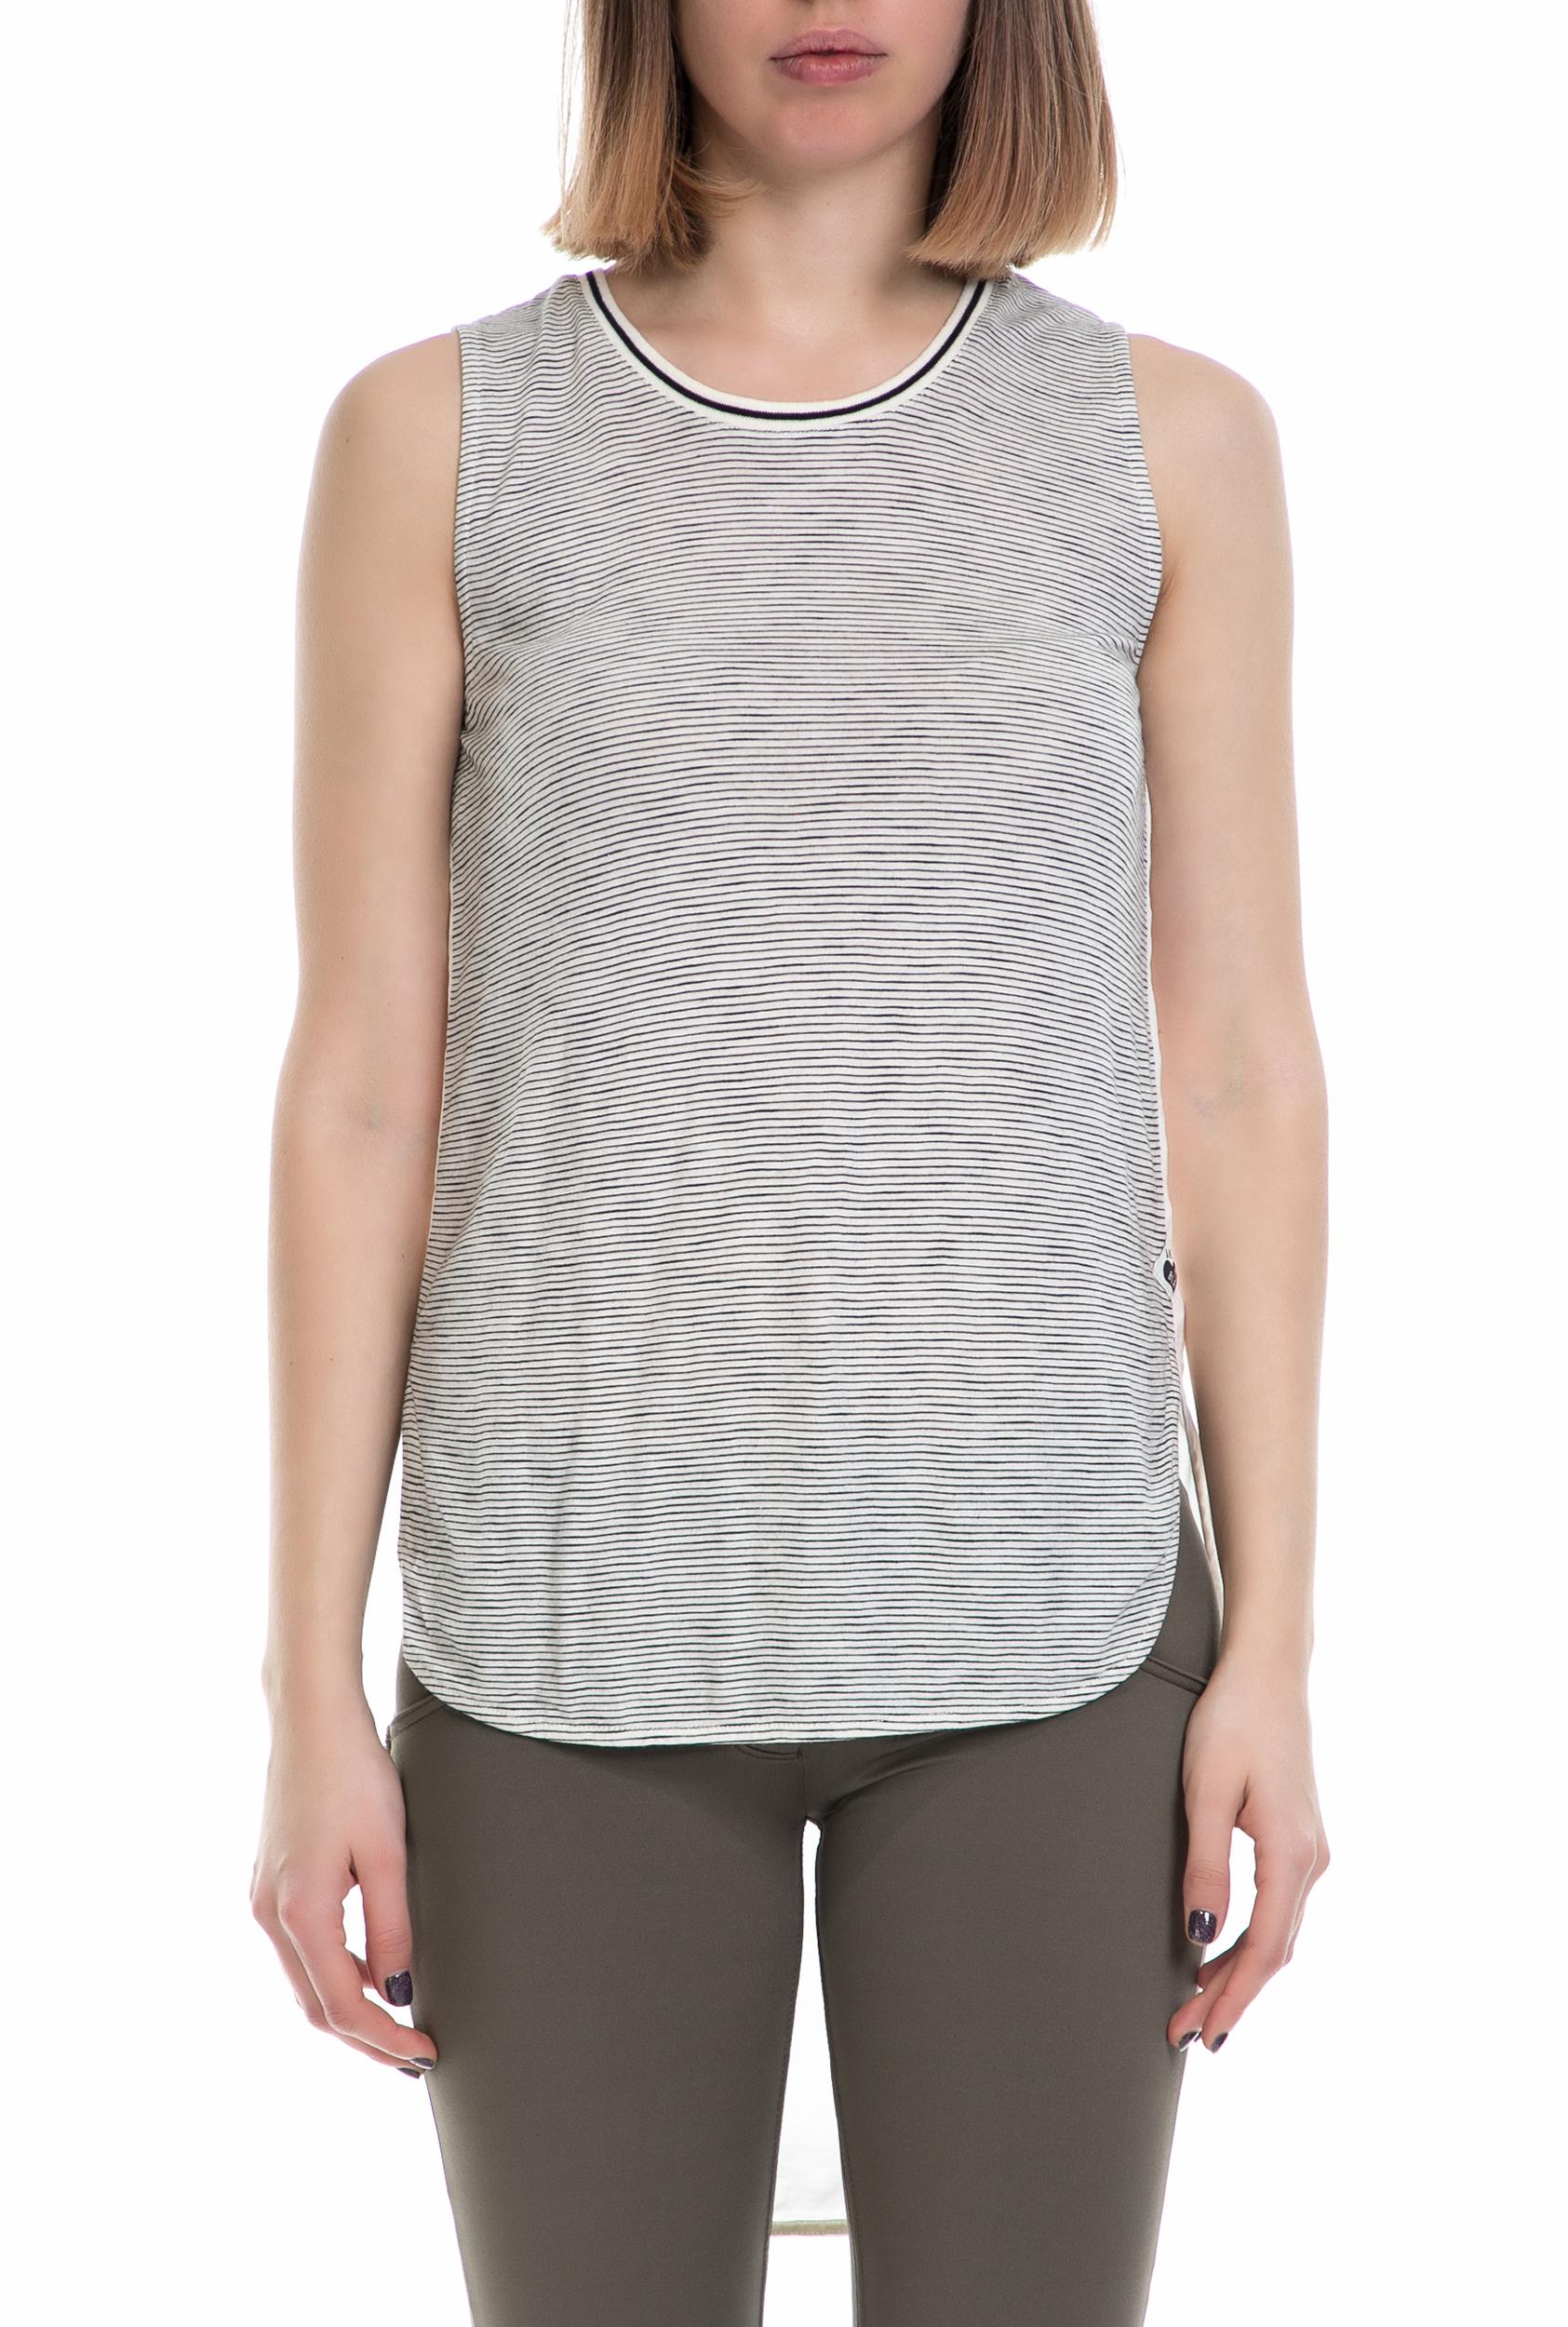 SCOTCH & SODA - Γυναικείο τοπ SCOTCH & SODA μαύρο-λευκό γυναικεία ρούχα μπλούζες αμάνικες